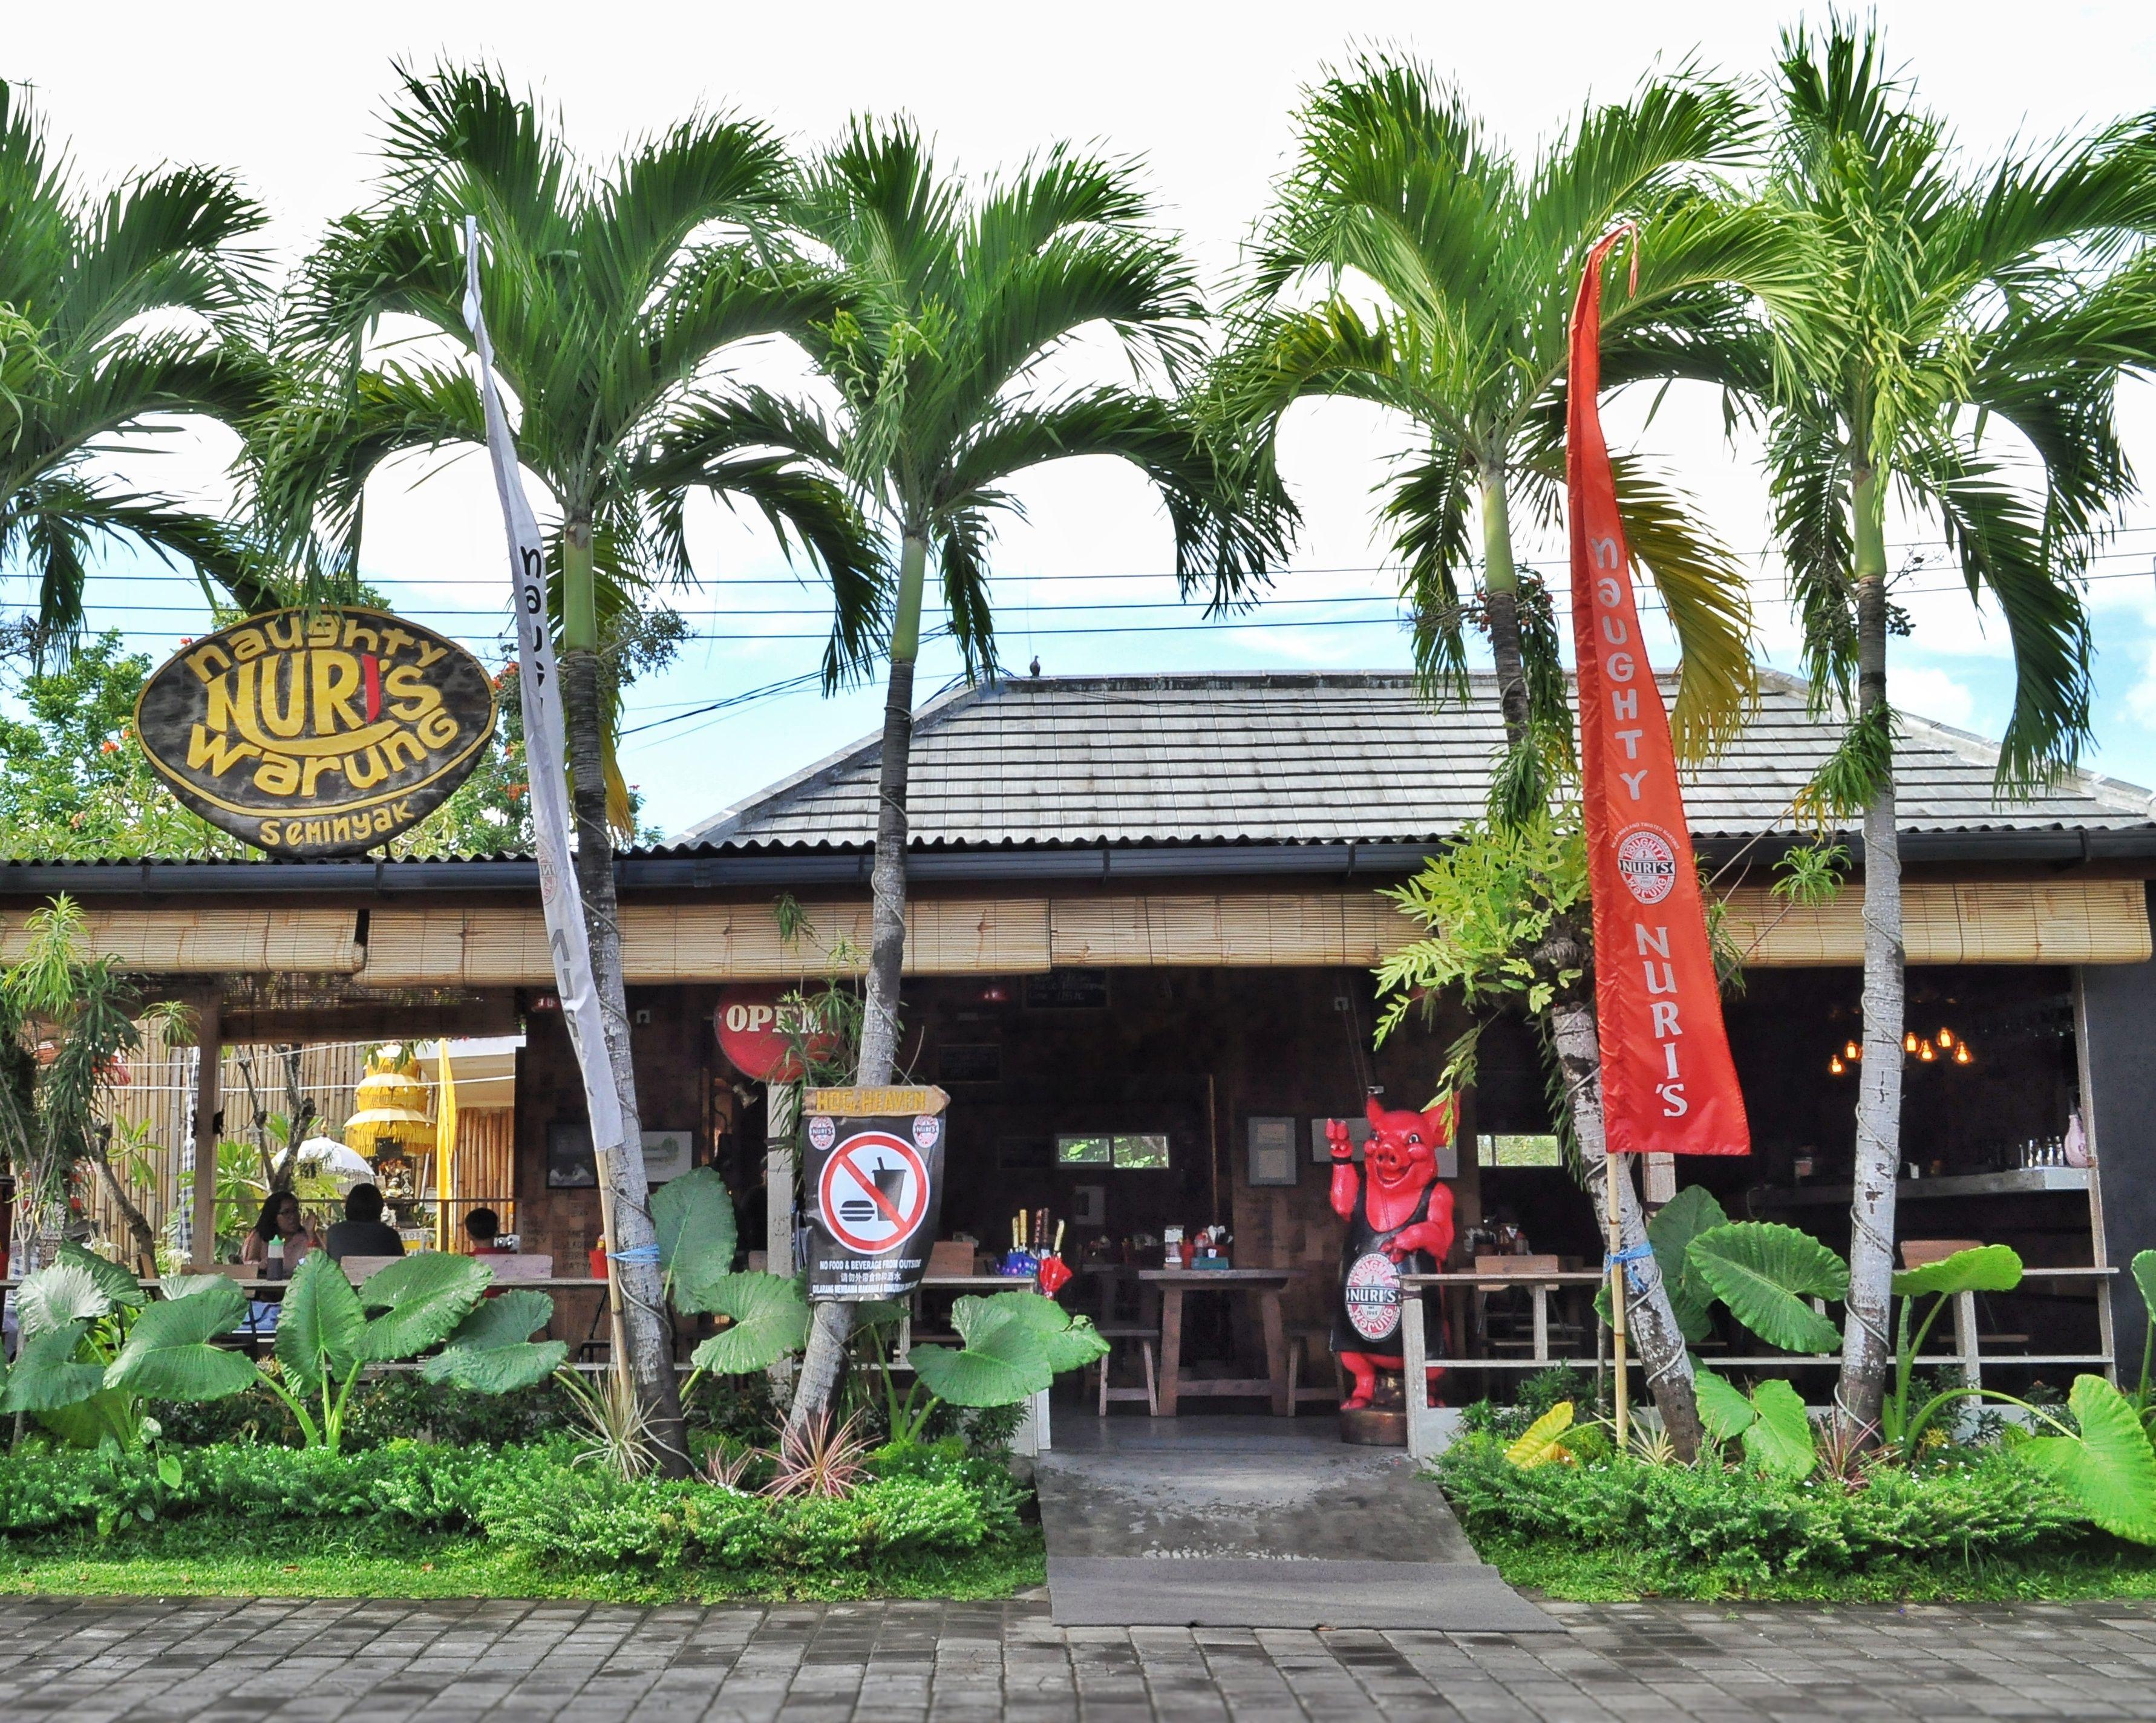 From Ubud to Seminyak. Naughty Nuri's the legendary Ubud's pork ribs have  recently opened in